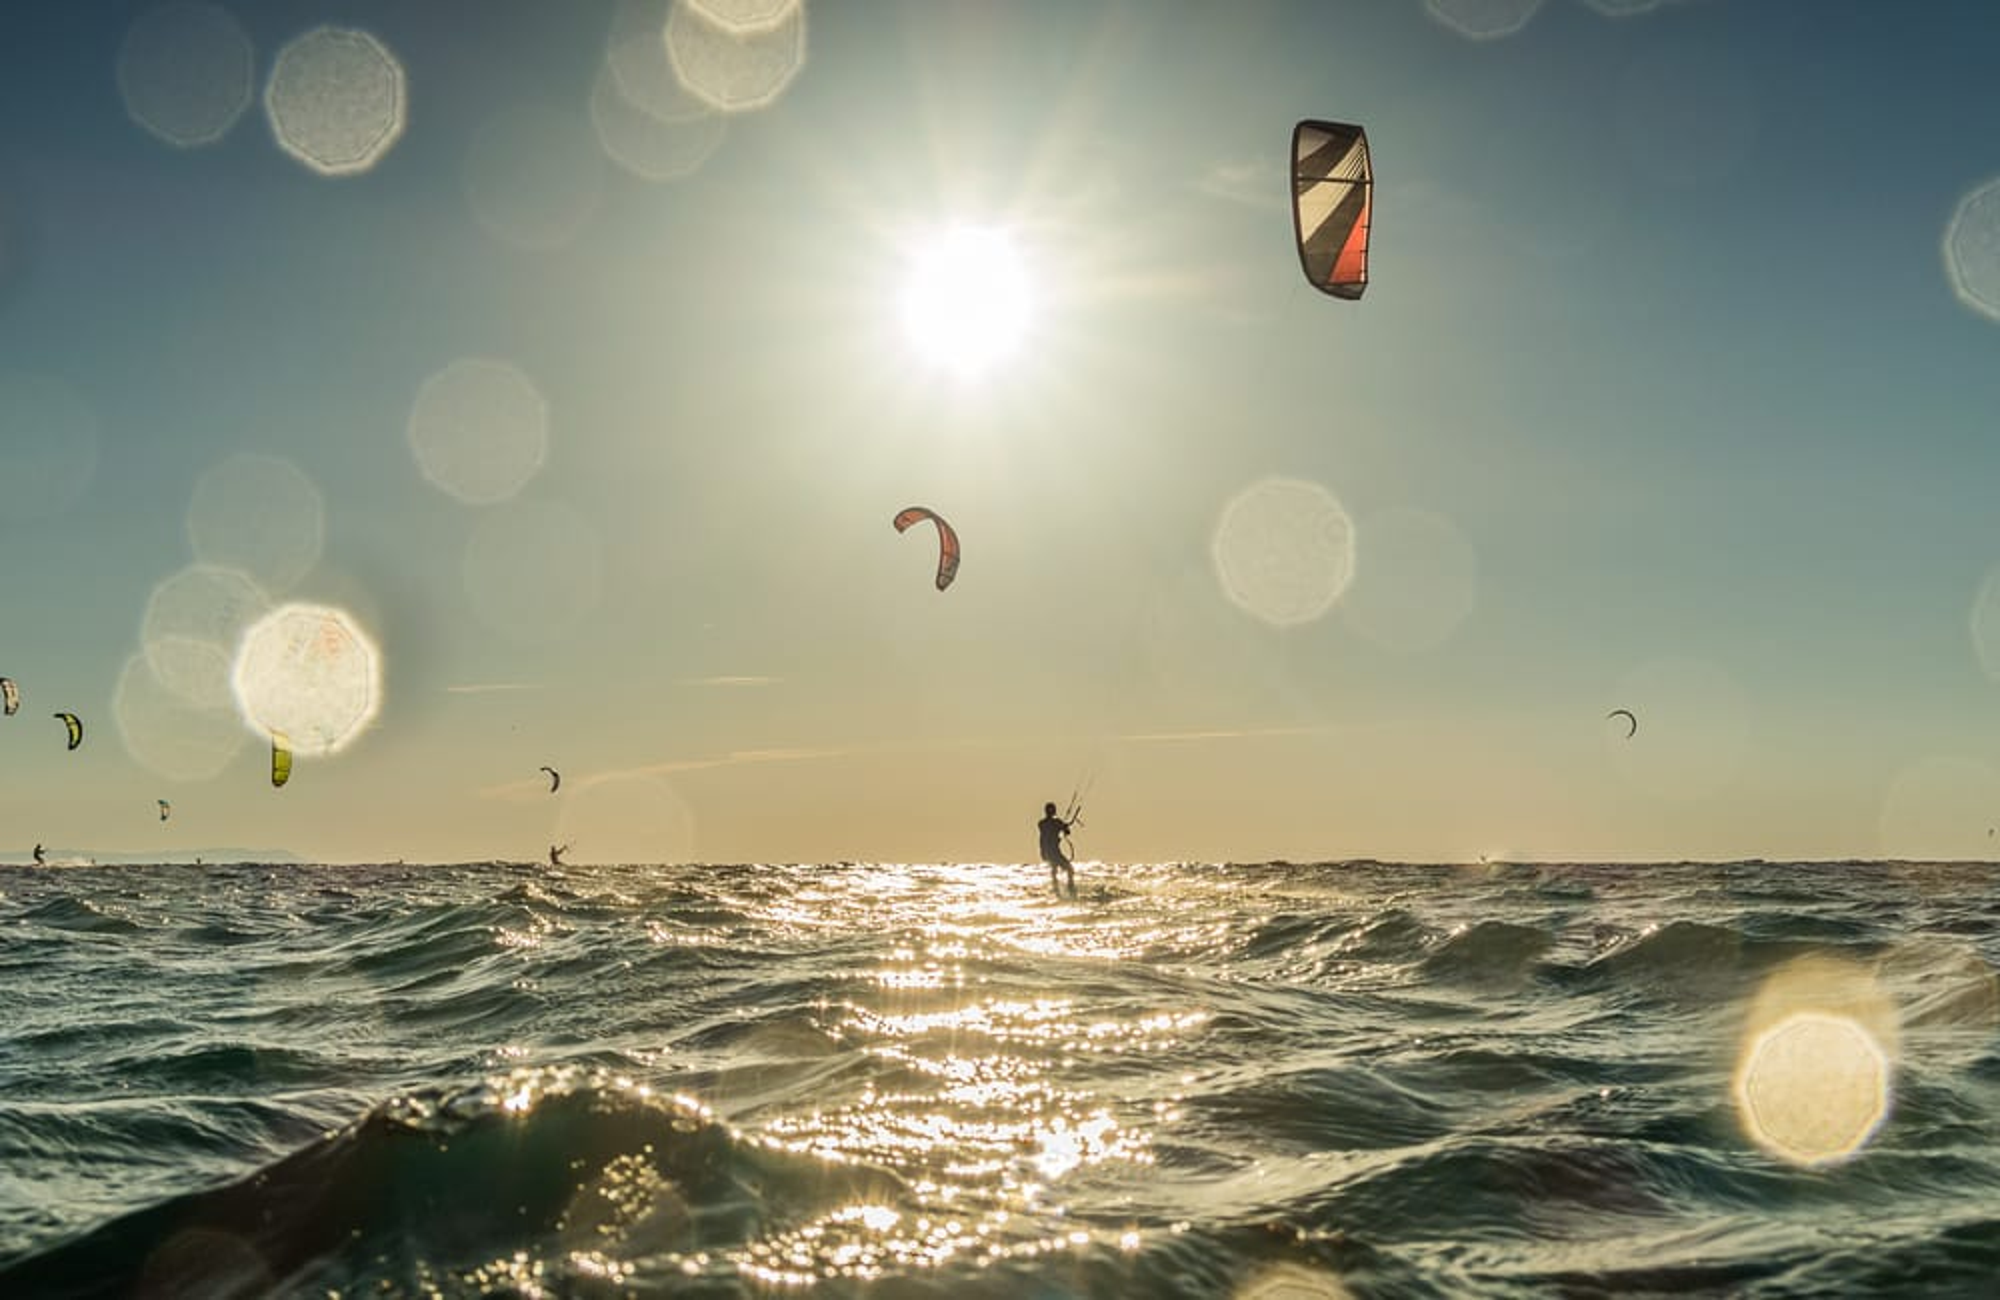 Des gens pratiquant le kitesurf.